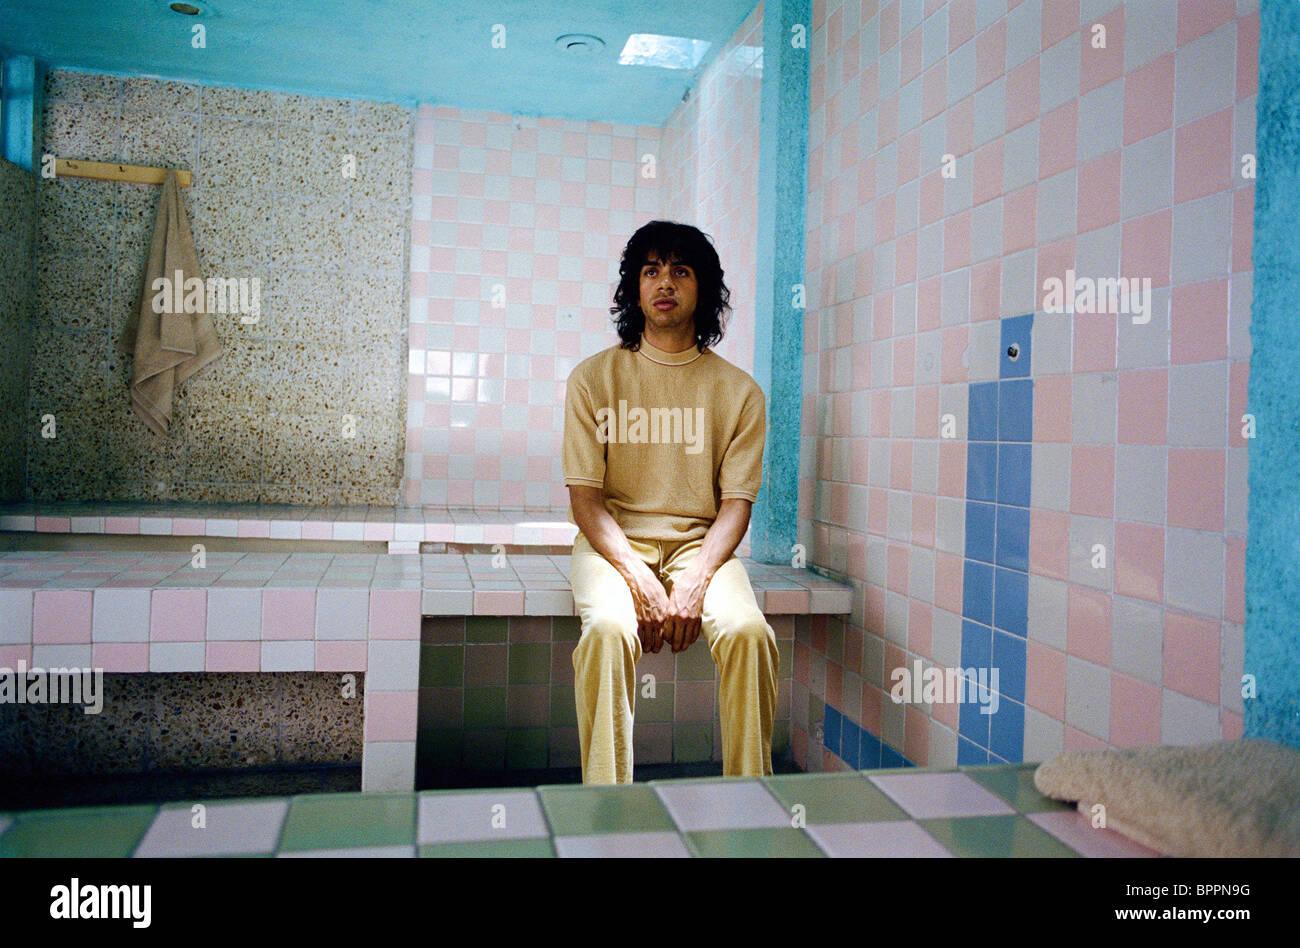 HECTOR JIMENEZ NACHO LIBRE (2006) Photo Stock